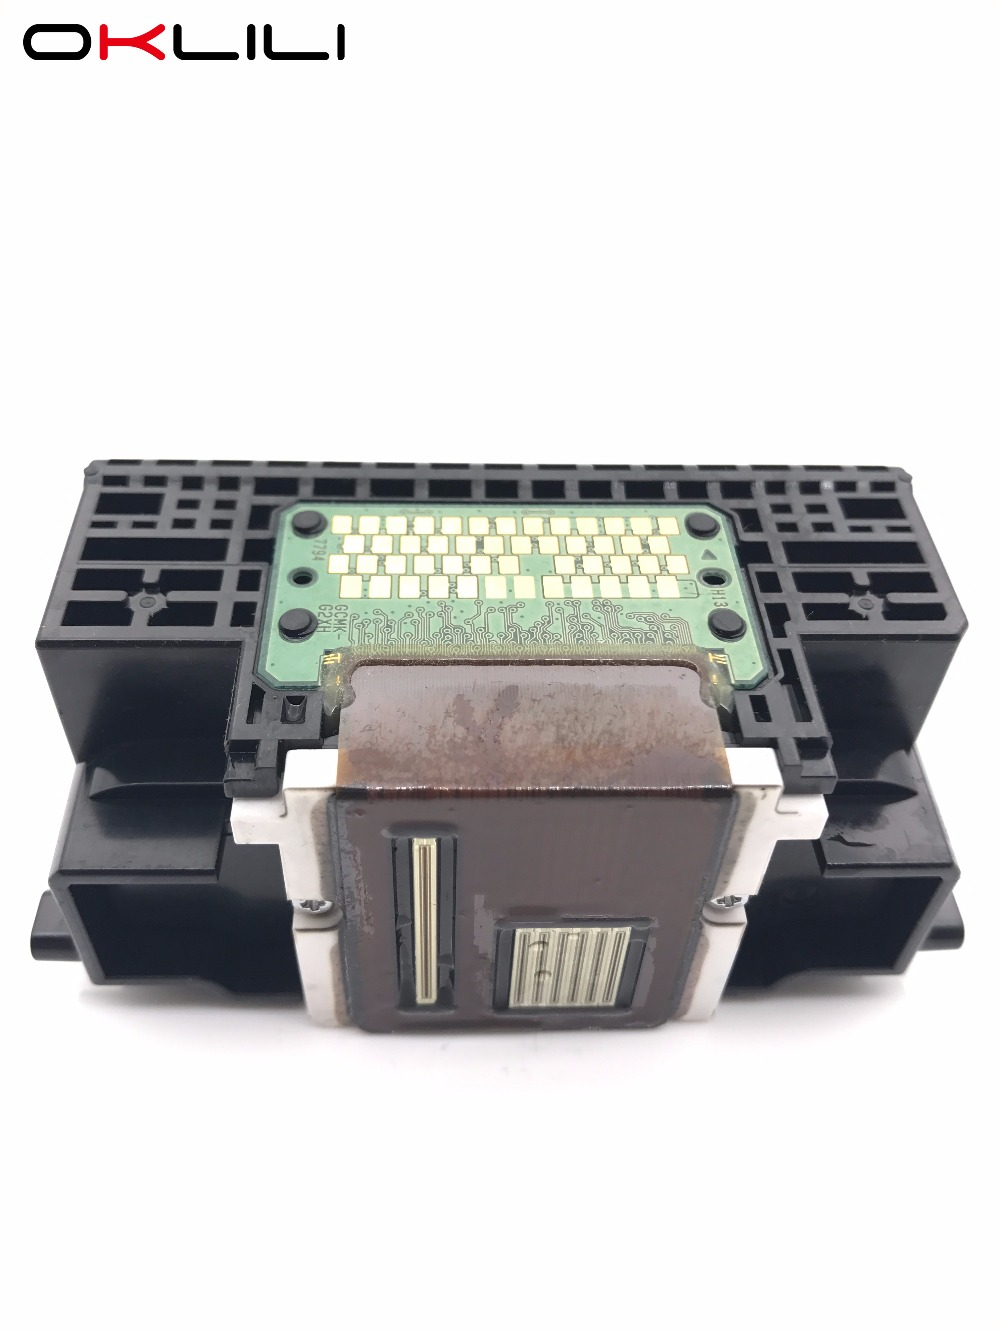 medium resolution of qy6 0080 printhead printer head print head for canon ip4820 ip4840 ip4850 ix6520 ix6550 mx715